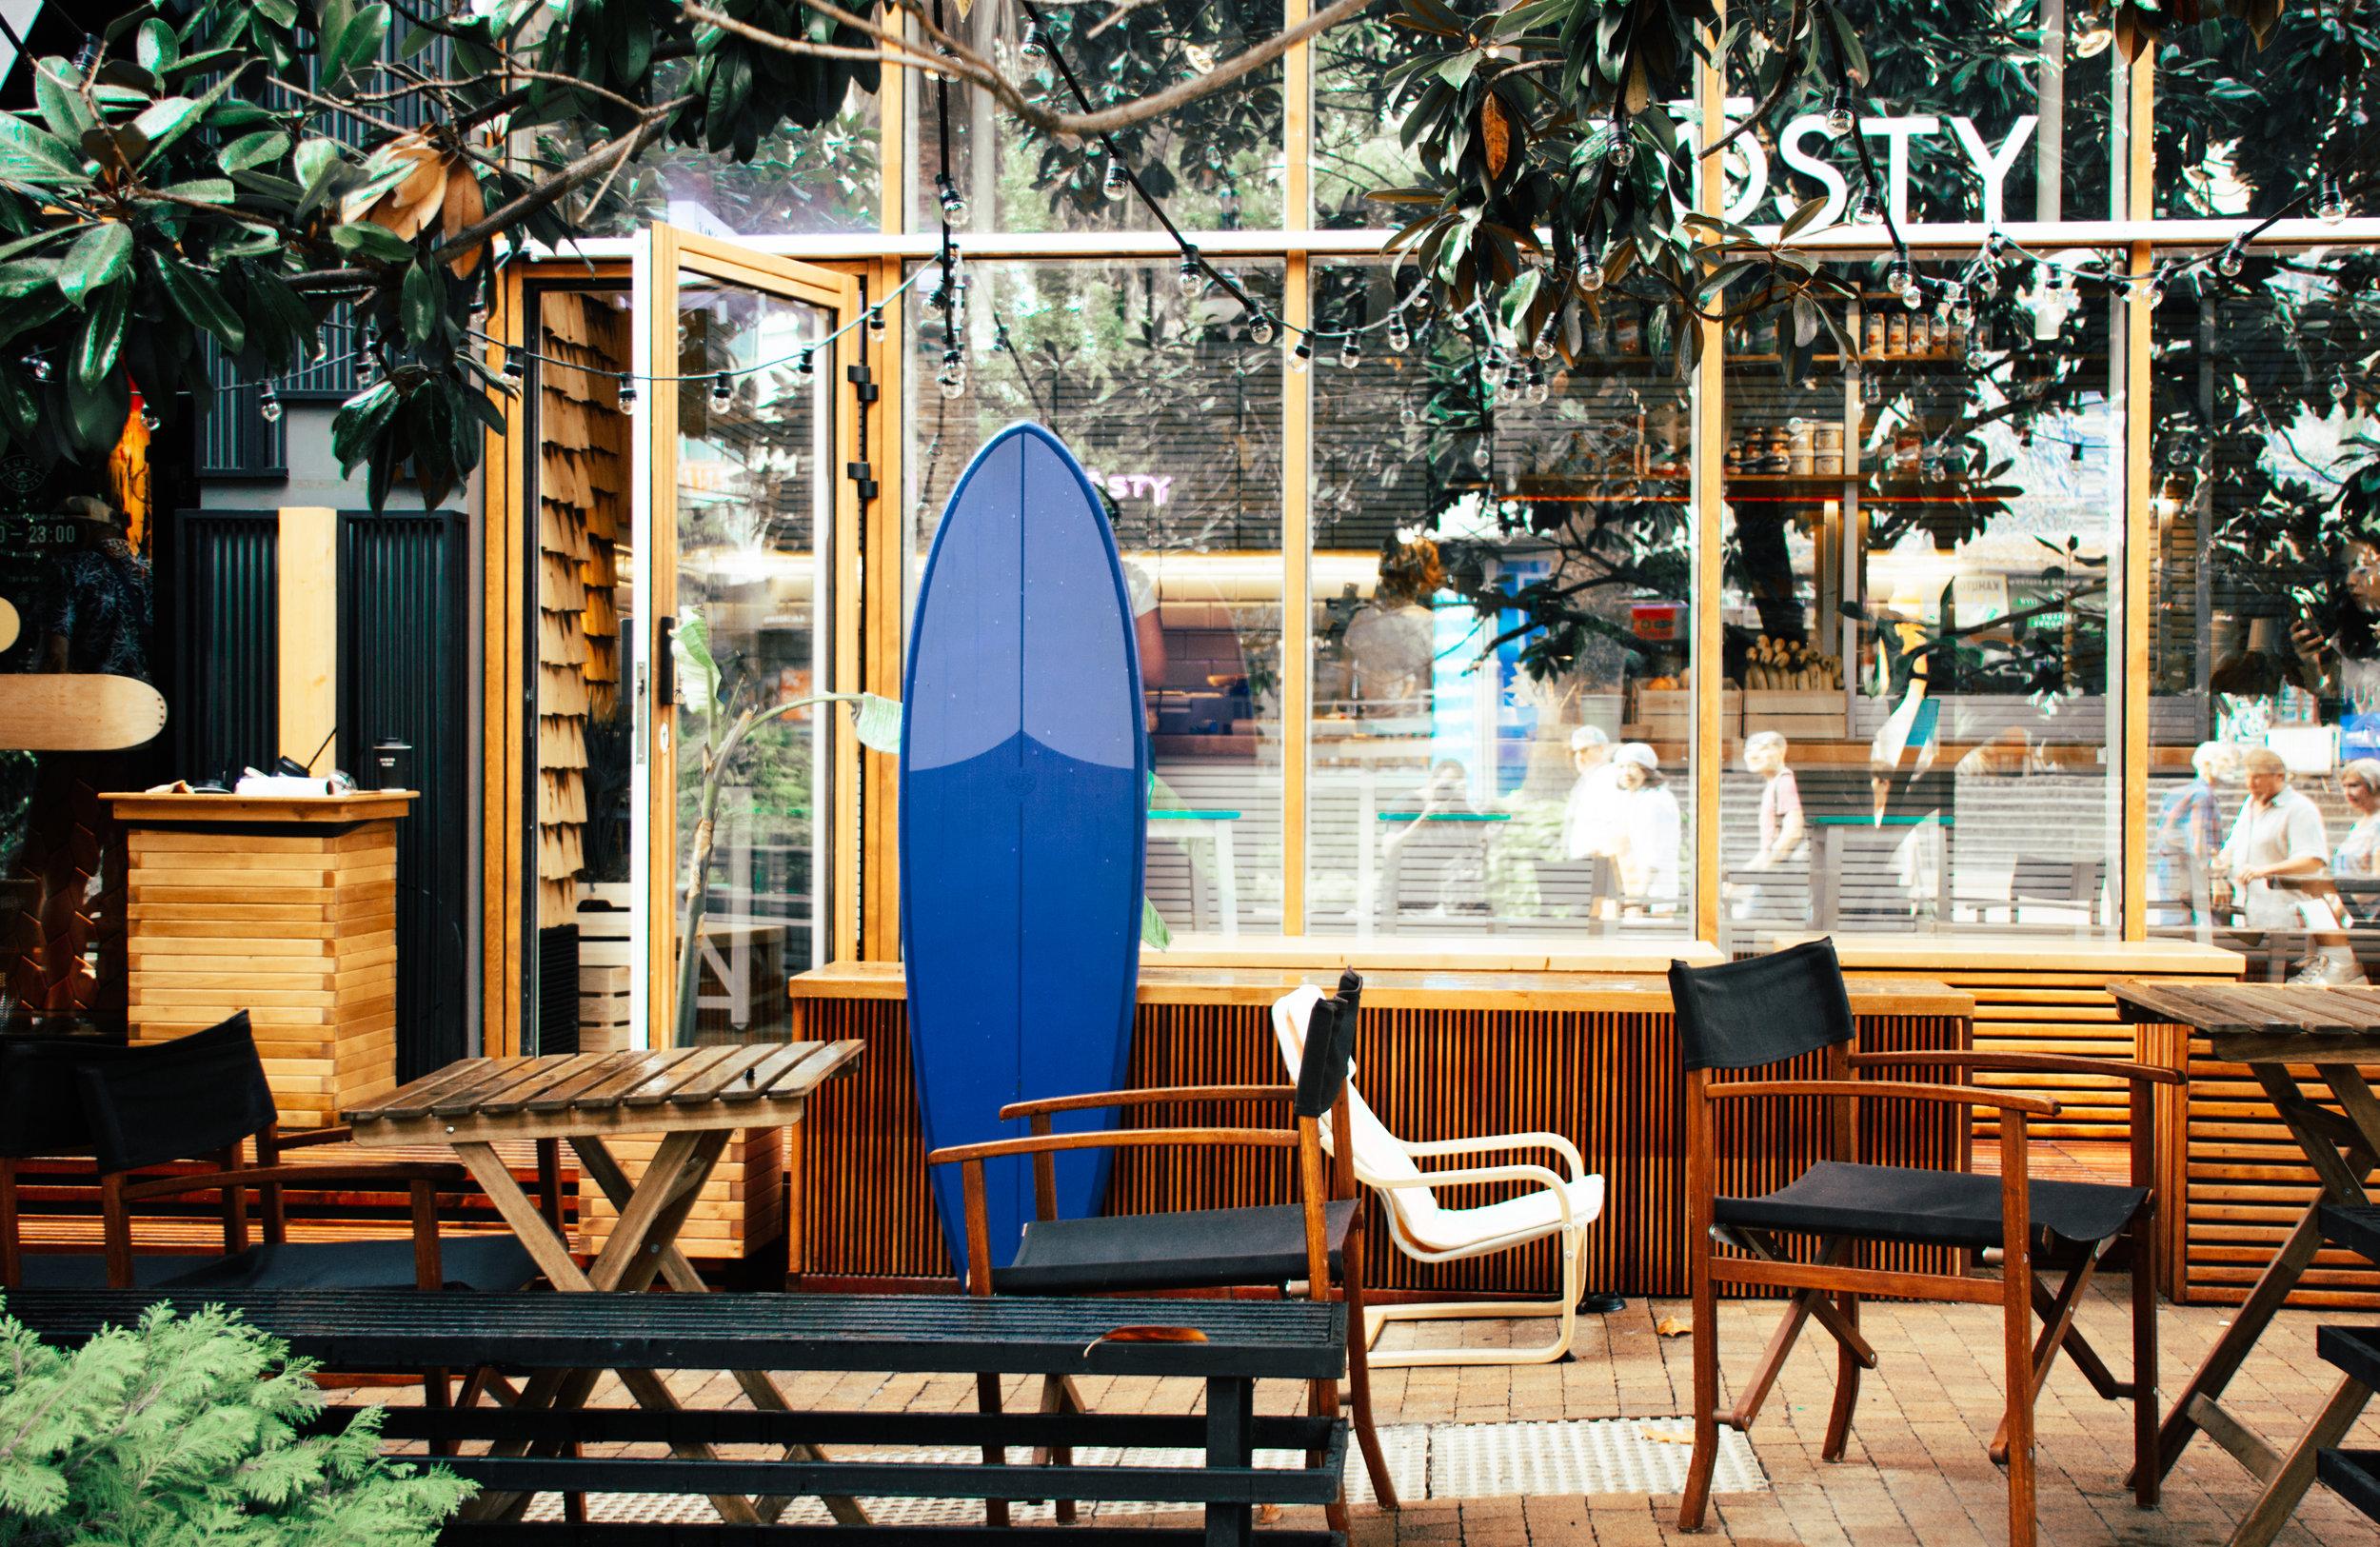 surf shop.jpg